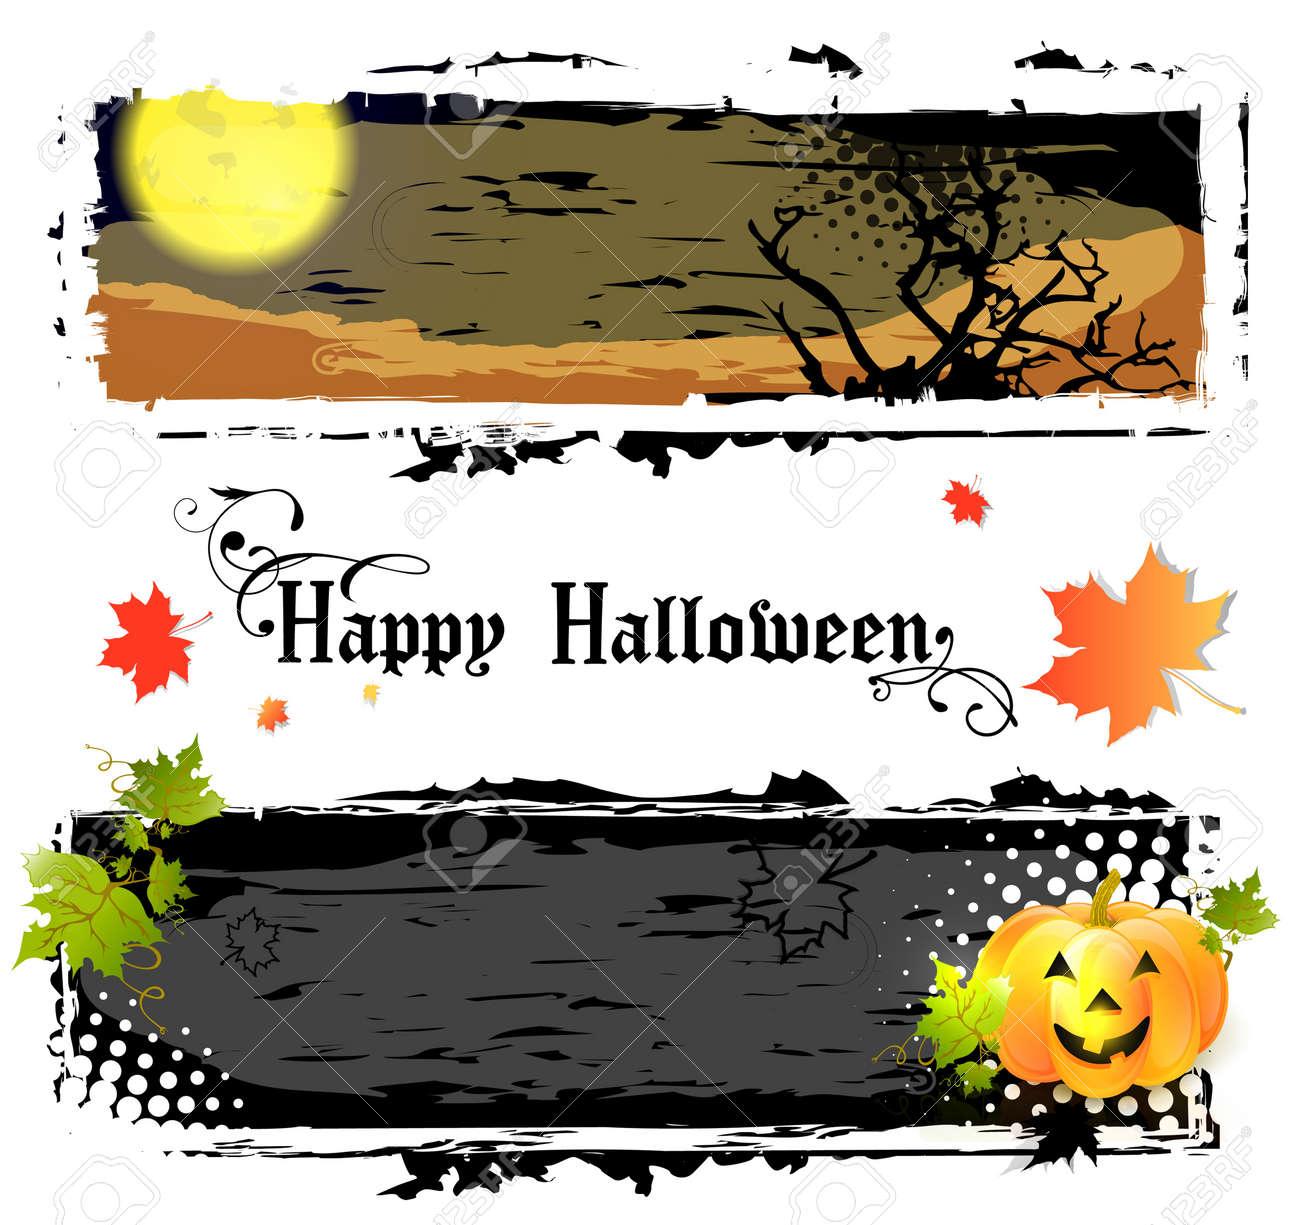 Happy Halloween Banners With Pumpkin and Big Moon Stock Vector - 15071869